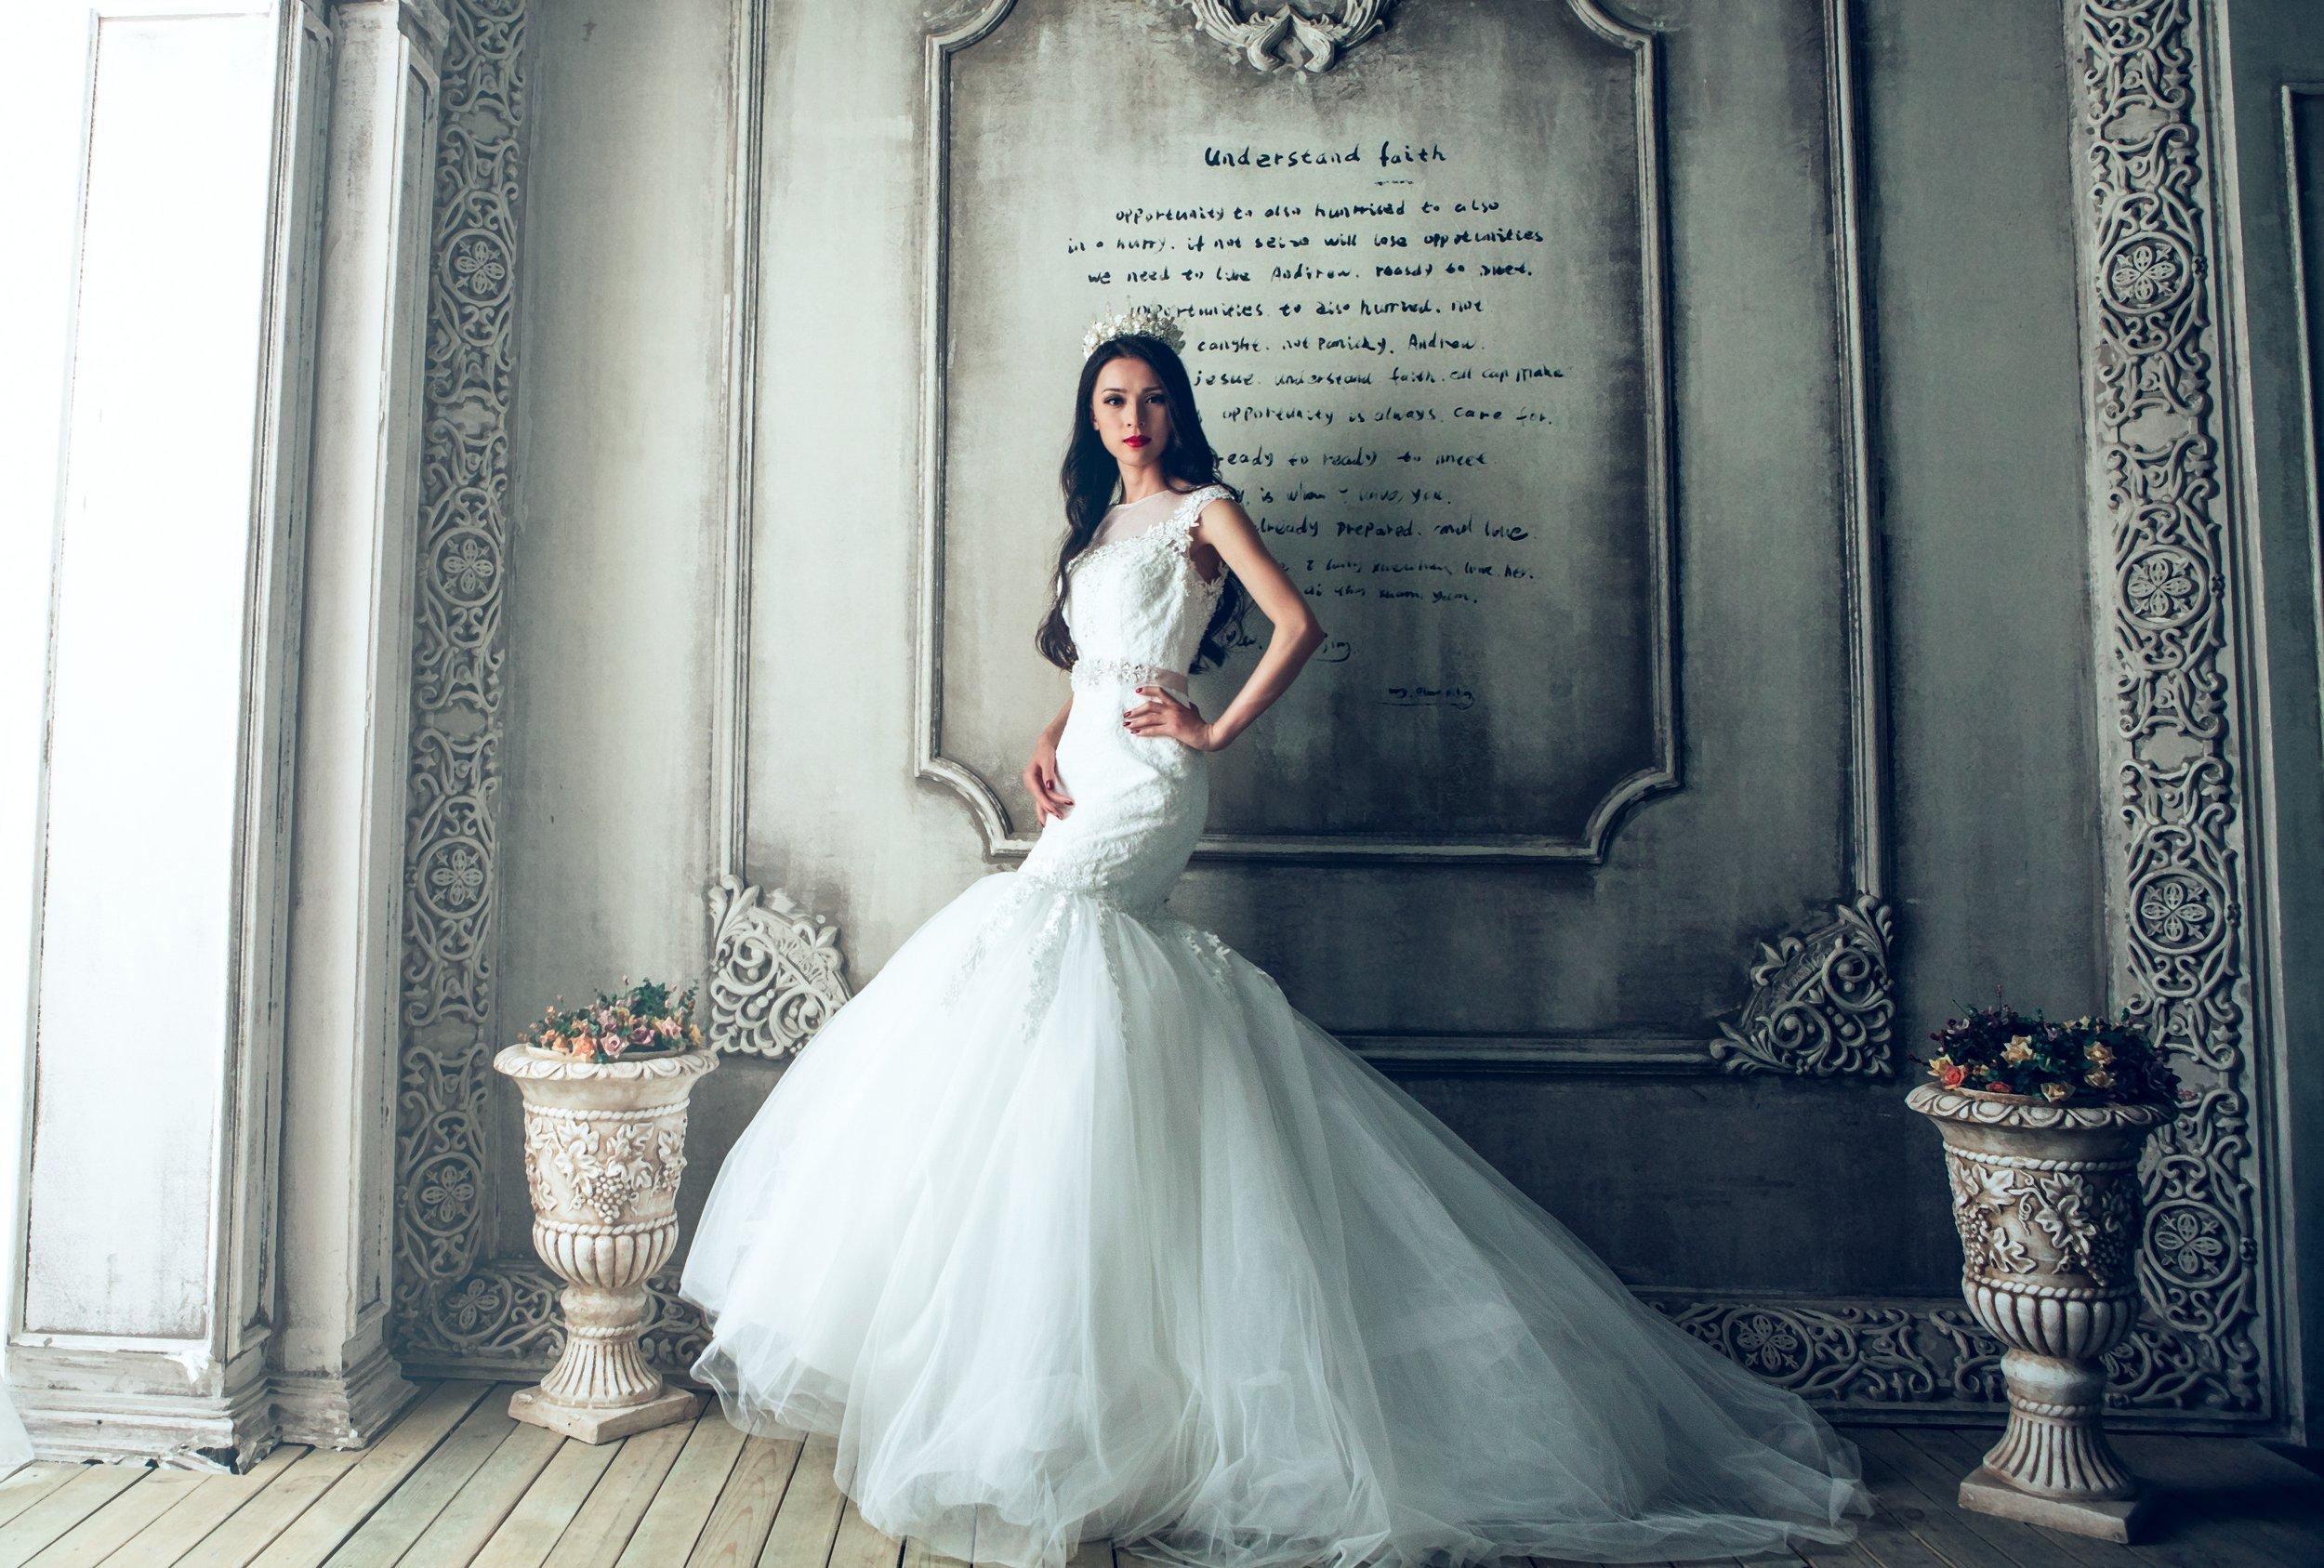 adult-bridal-bride-265720.jpg